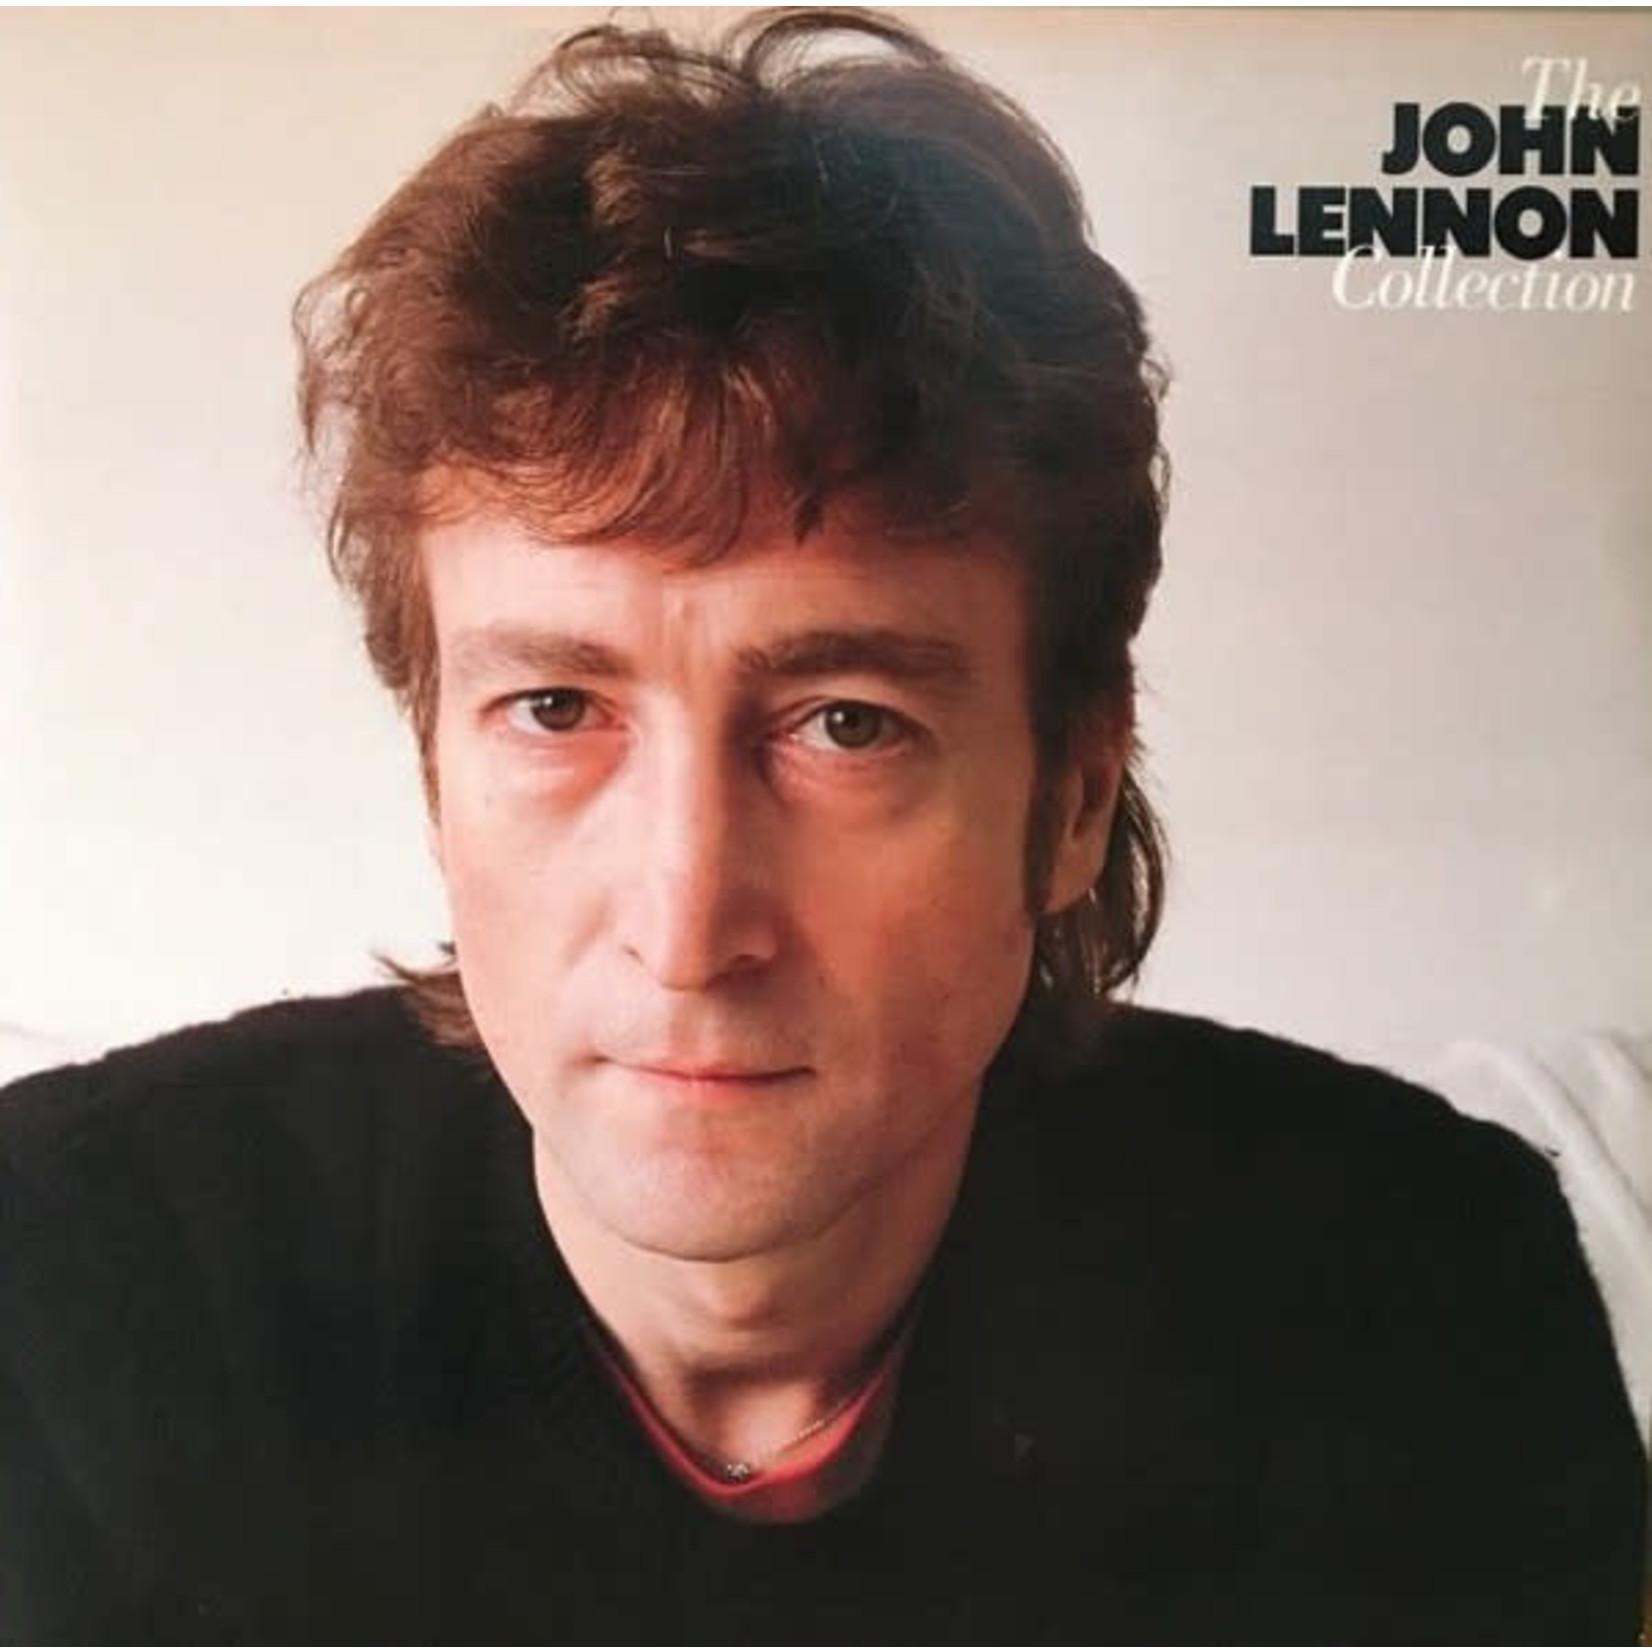 [Vintage] Lennon, John (Beatles): Collection